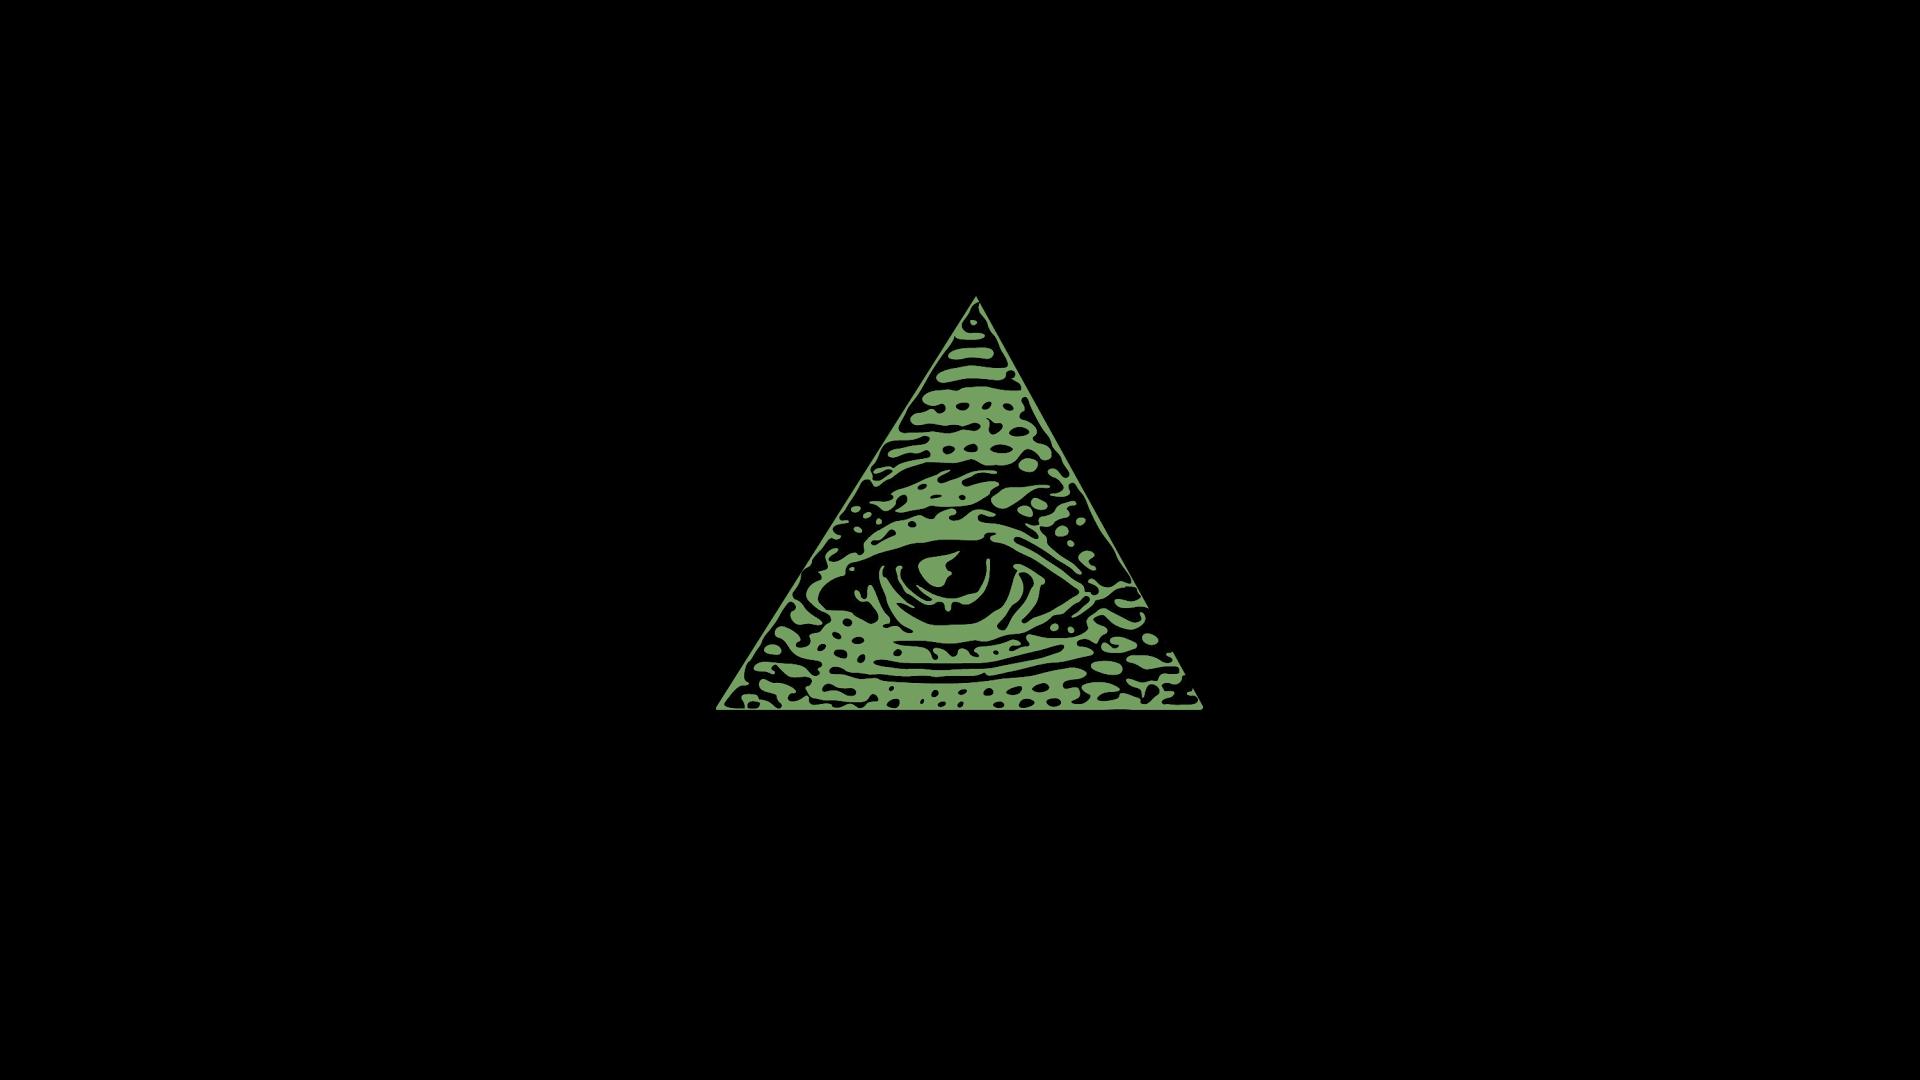 Alphabet U Wallpapers 3d Illuminati Logos